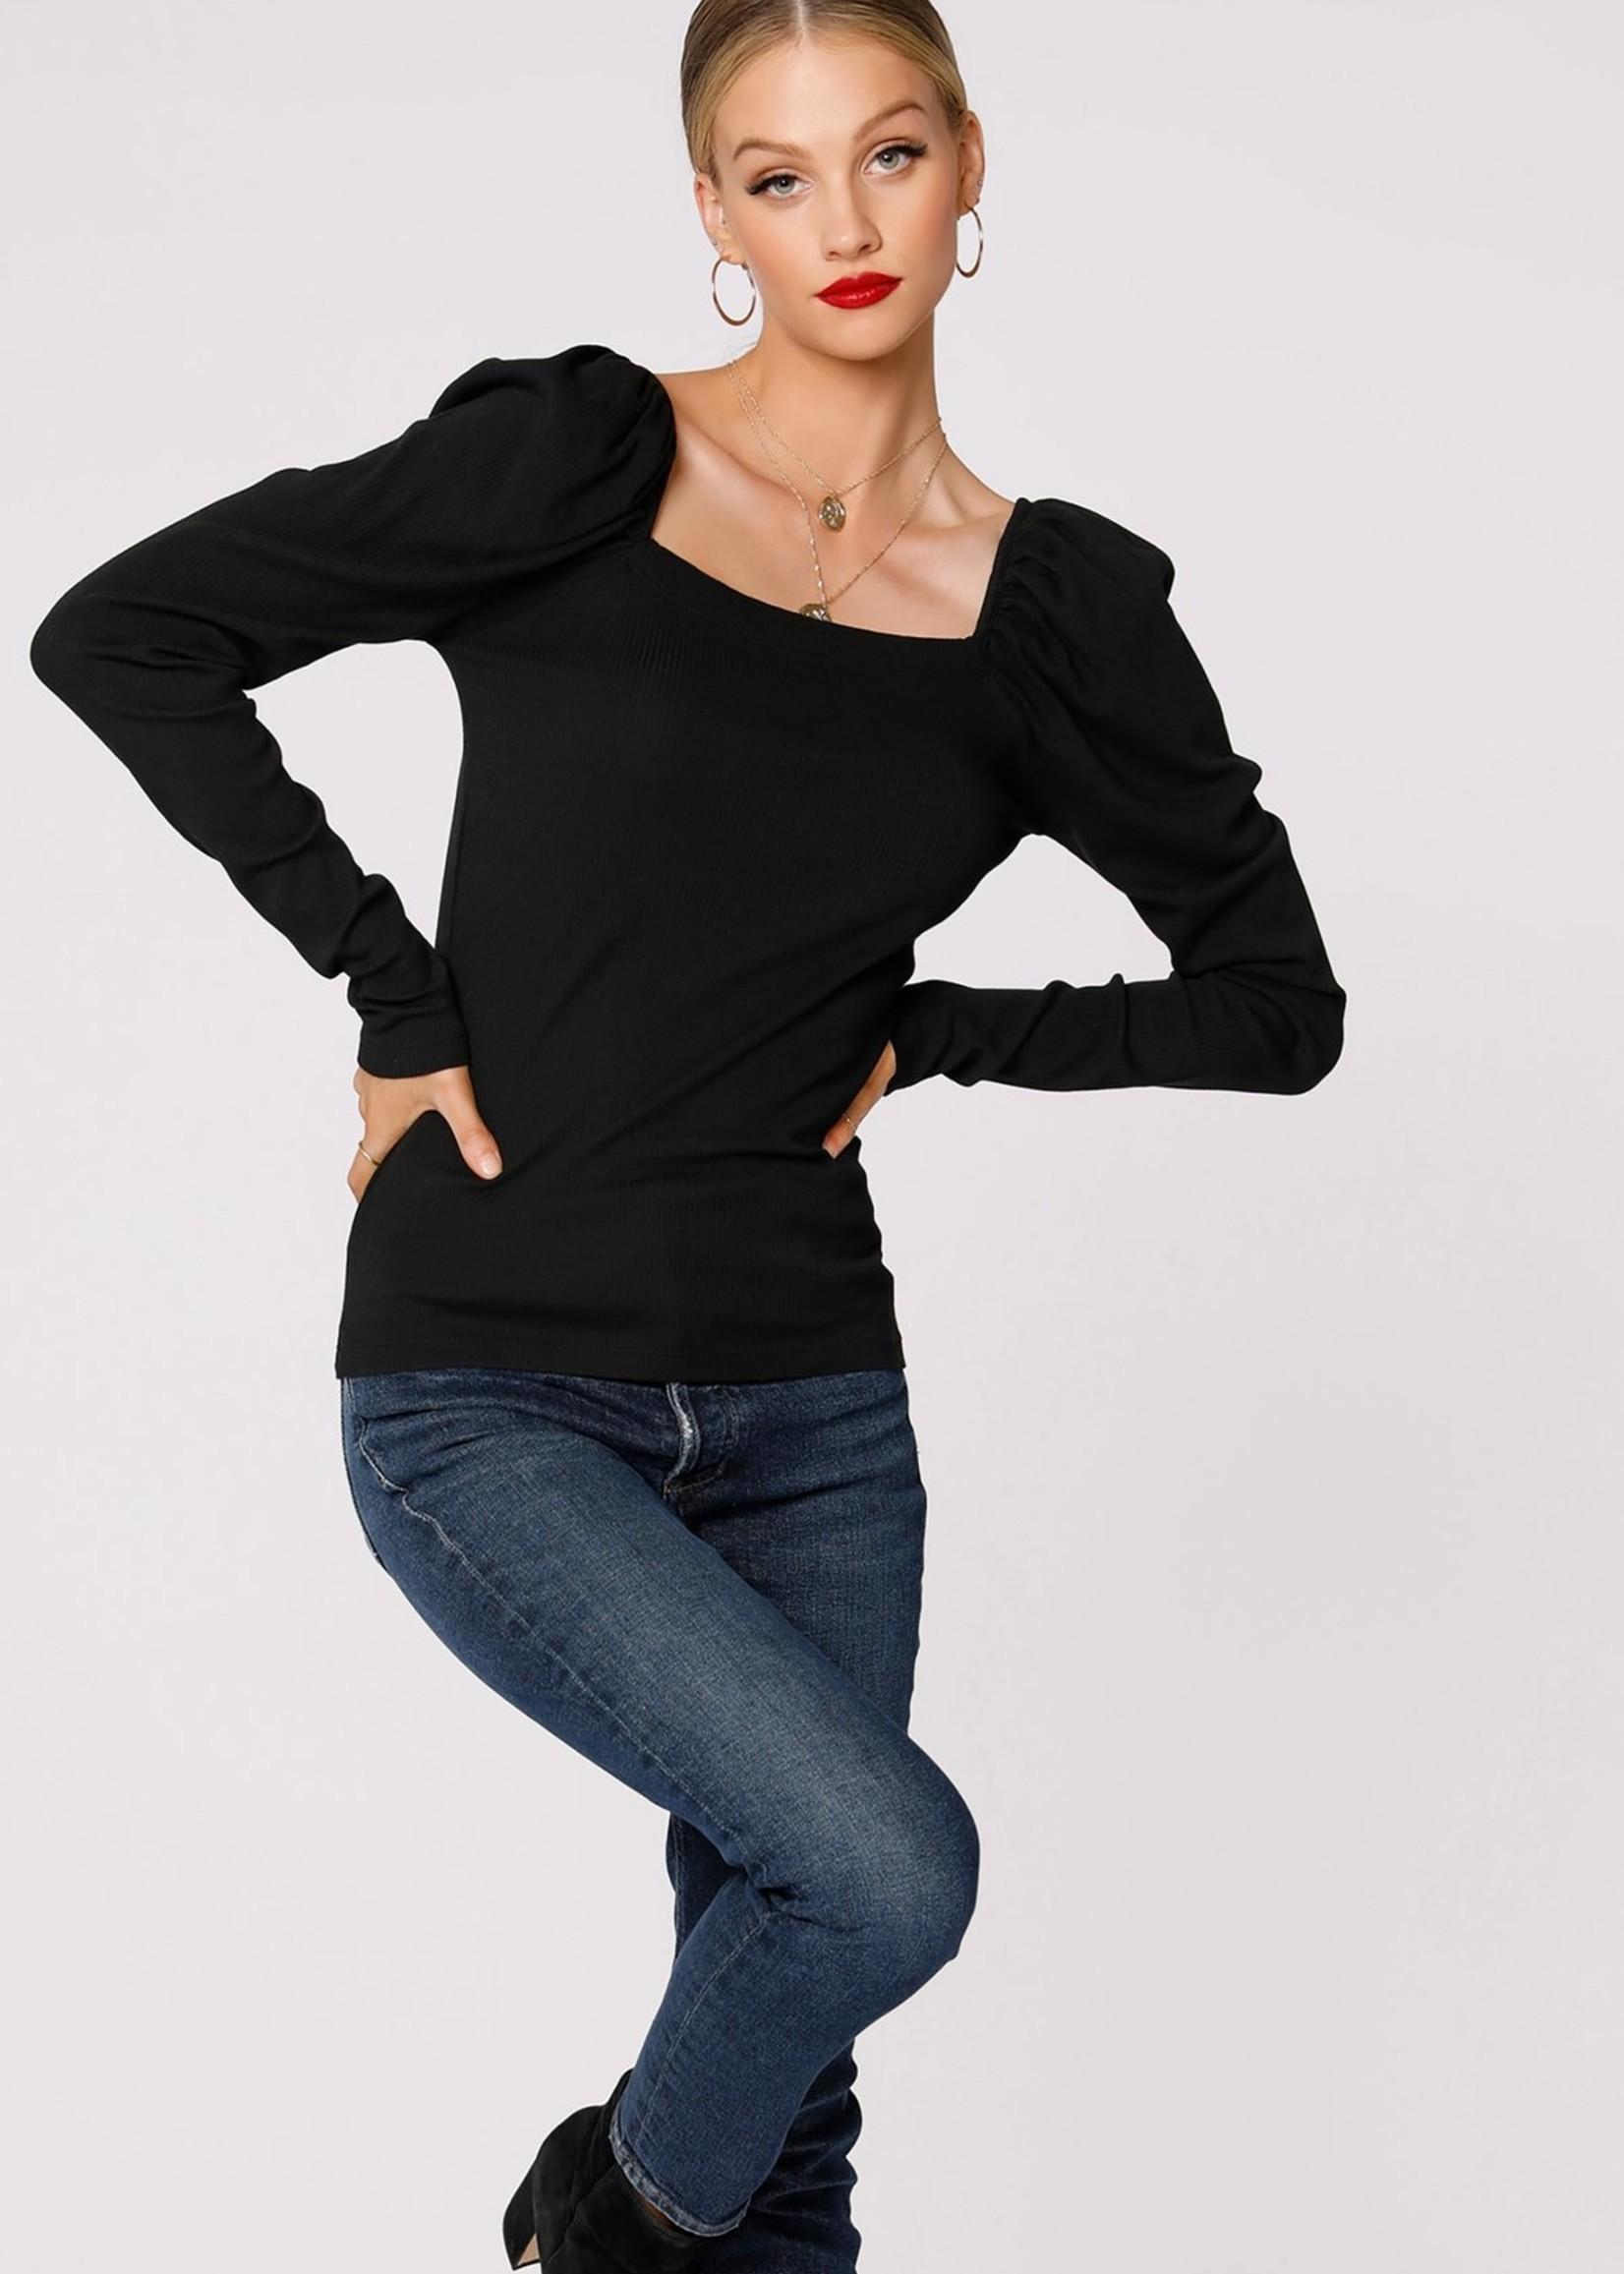 Bobi Shirred Sleeve Top - Black